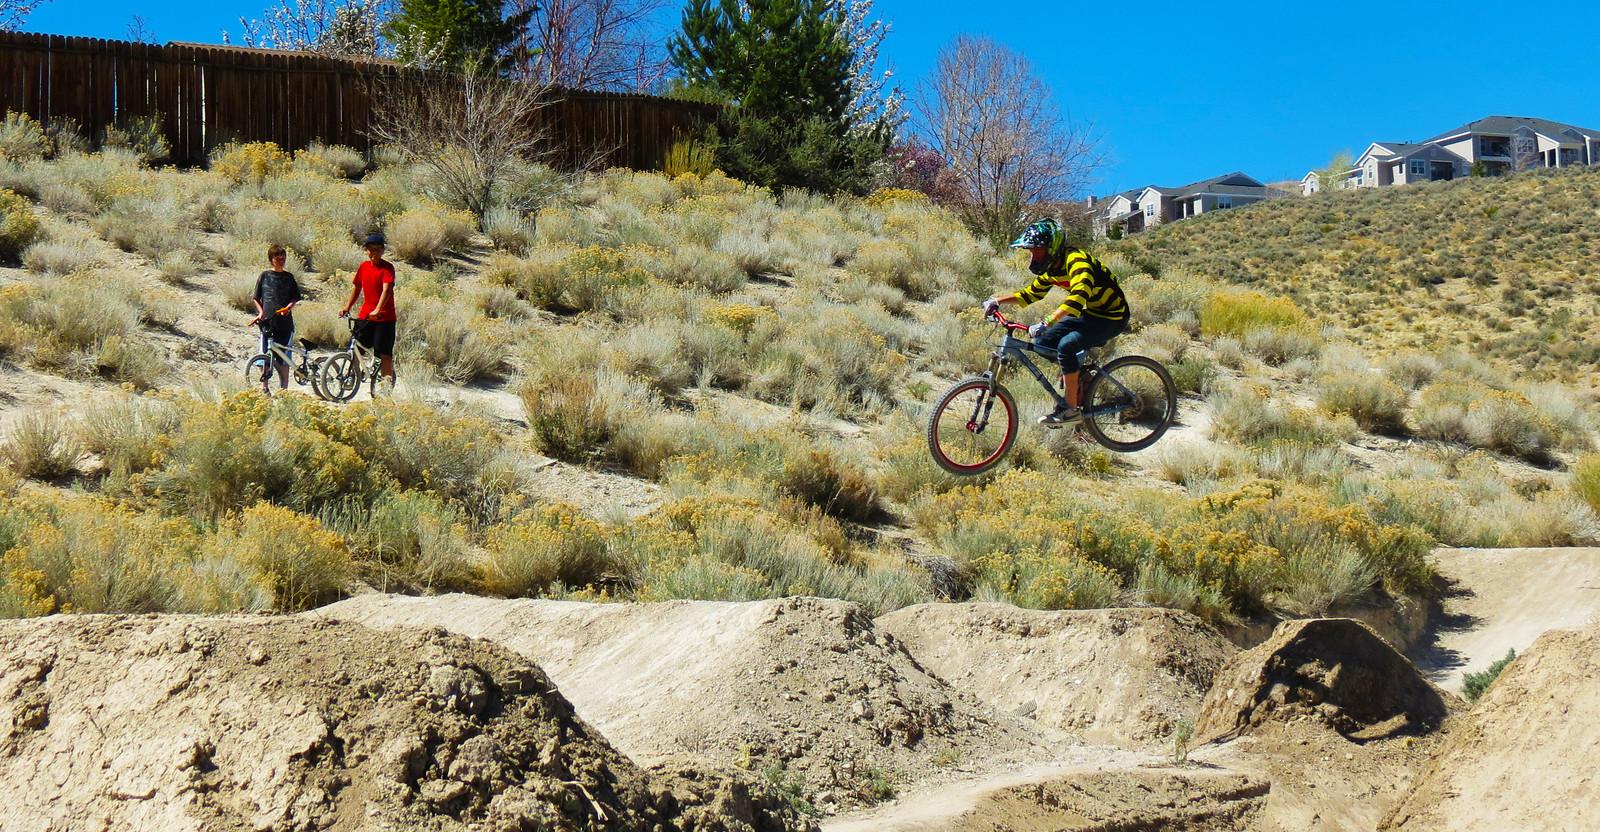 day 3 hip 2 crop - Moosey - Mountain Biking Pictures - Vital MTB